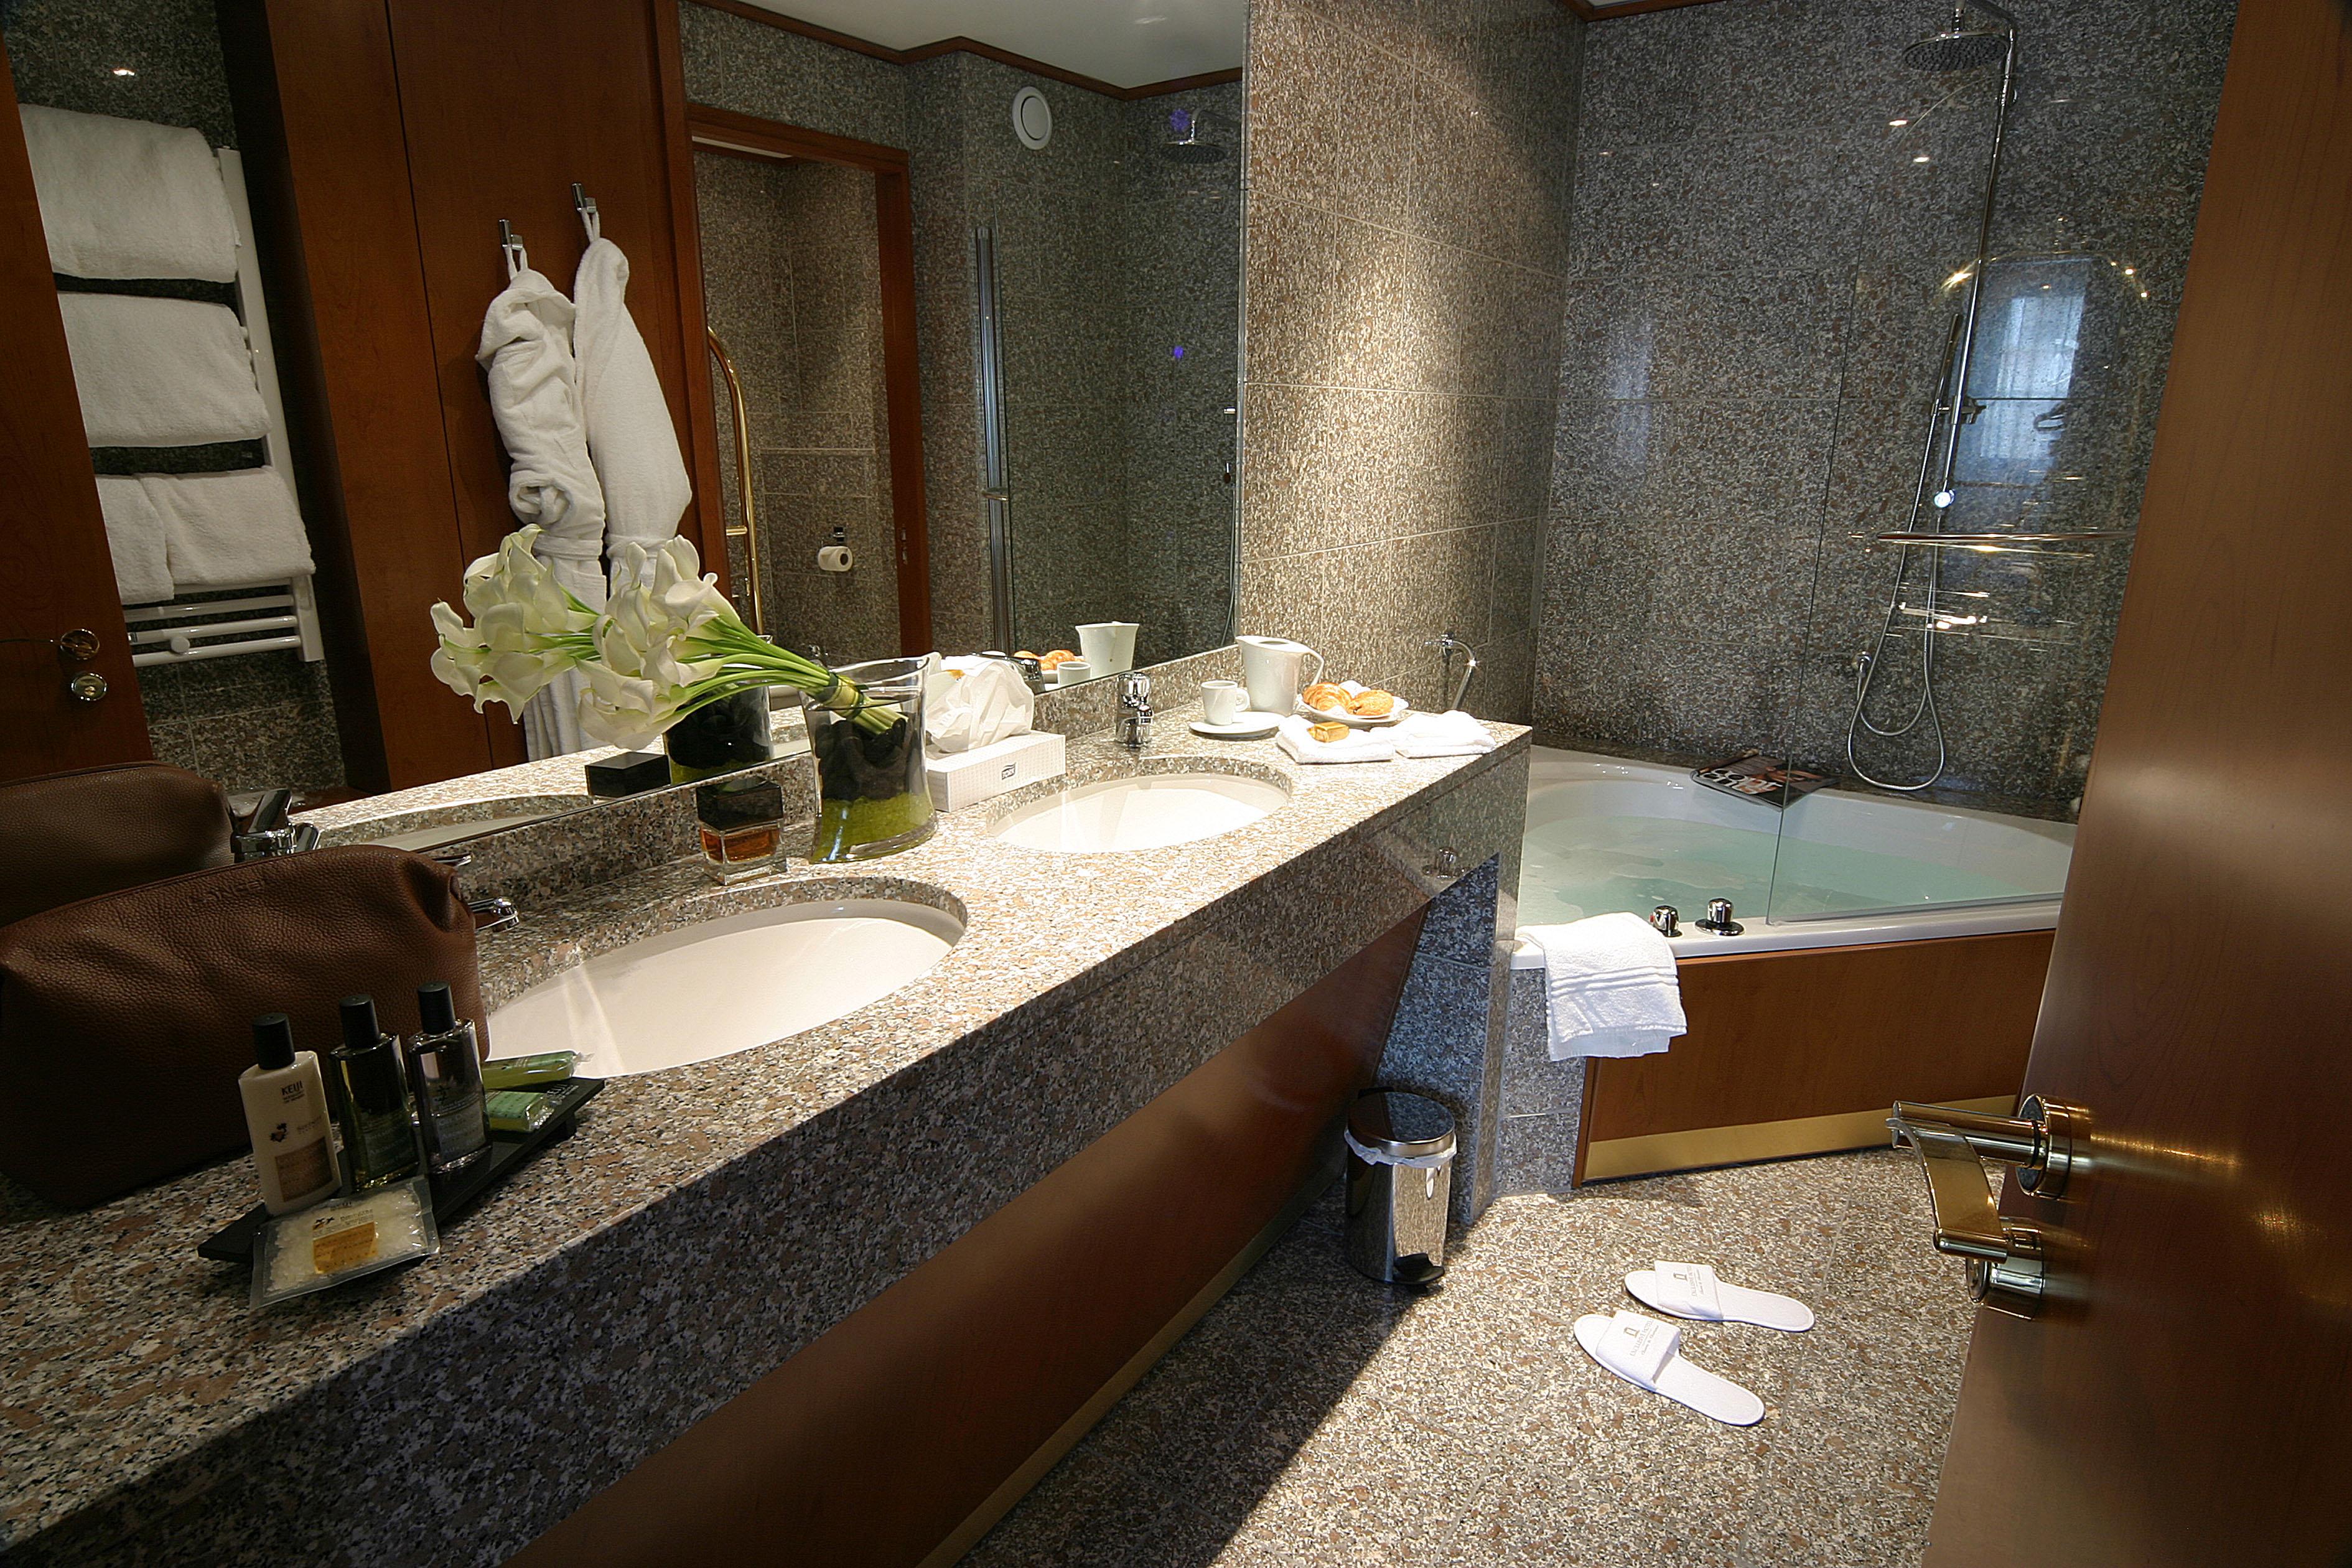 File salle de bains en granite hotel - Salle de abin ...